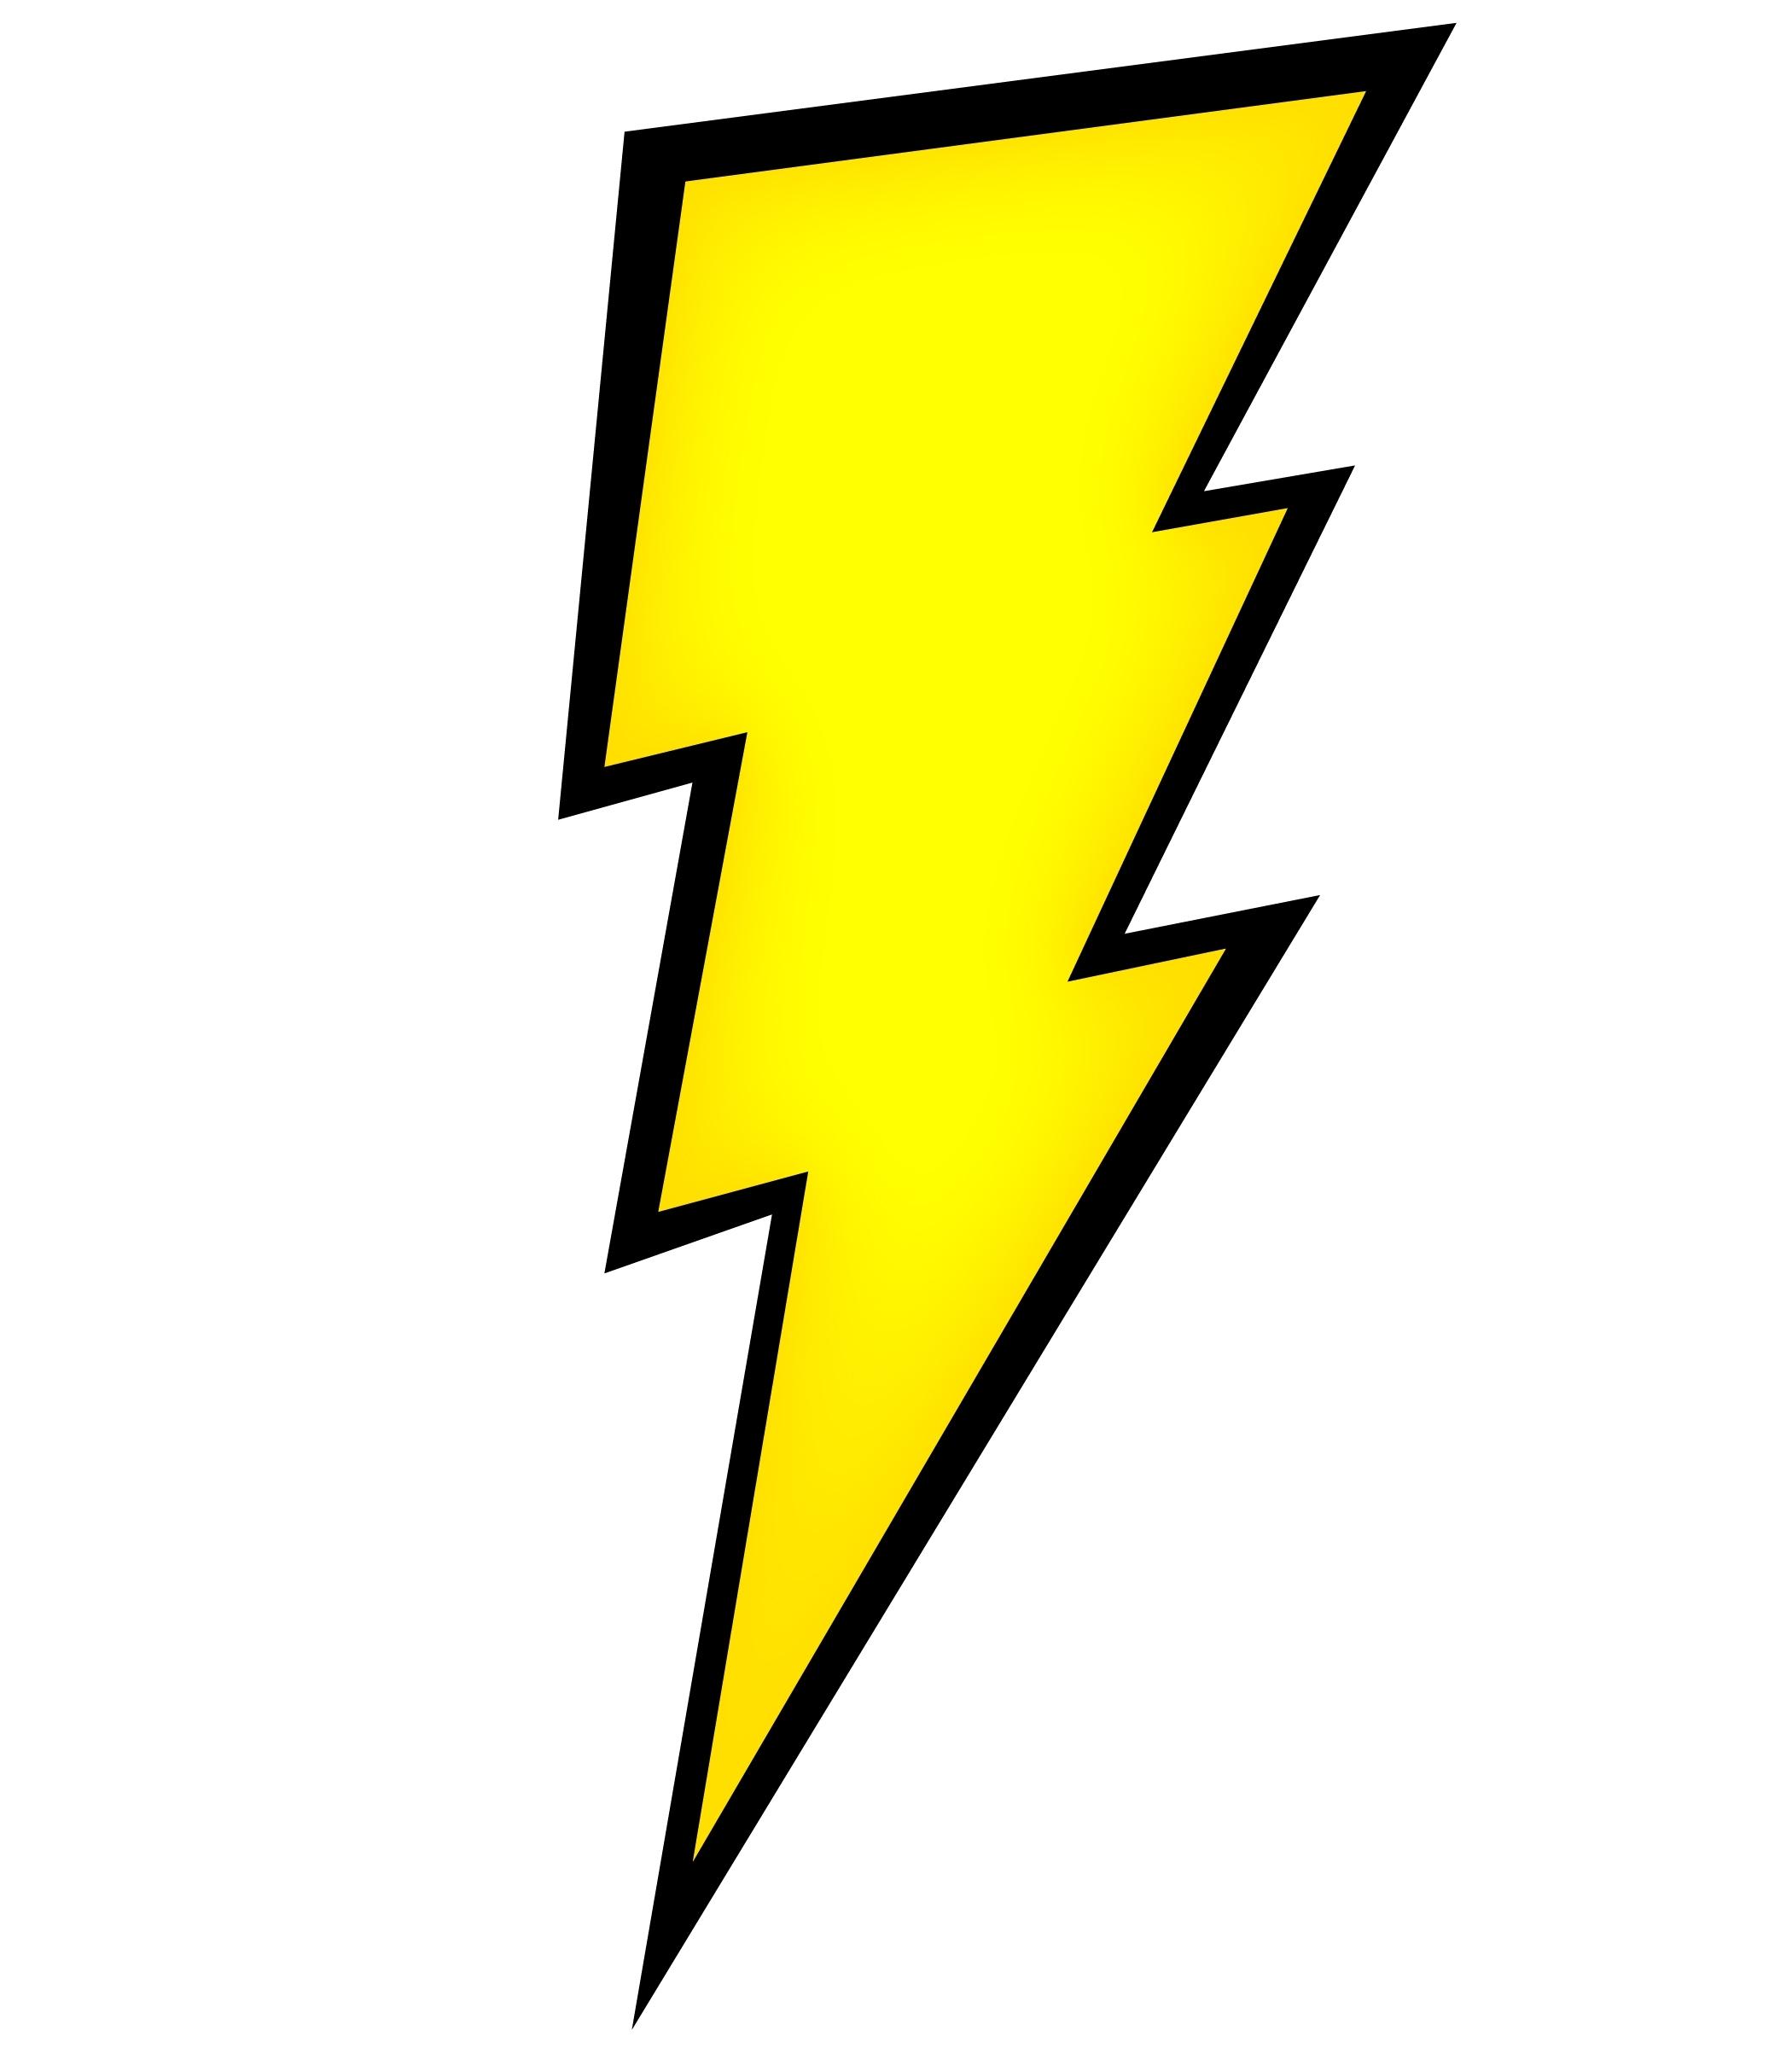 Lightning Bolt Clipart-lightning bolt clipart-12